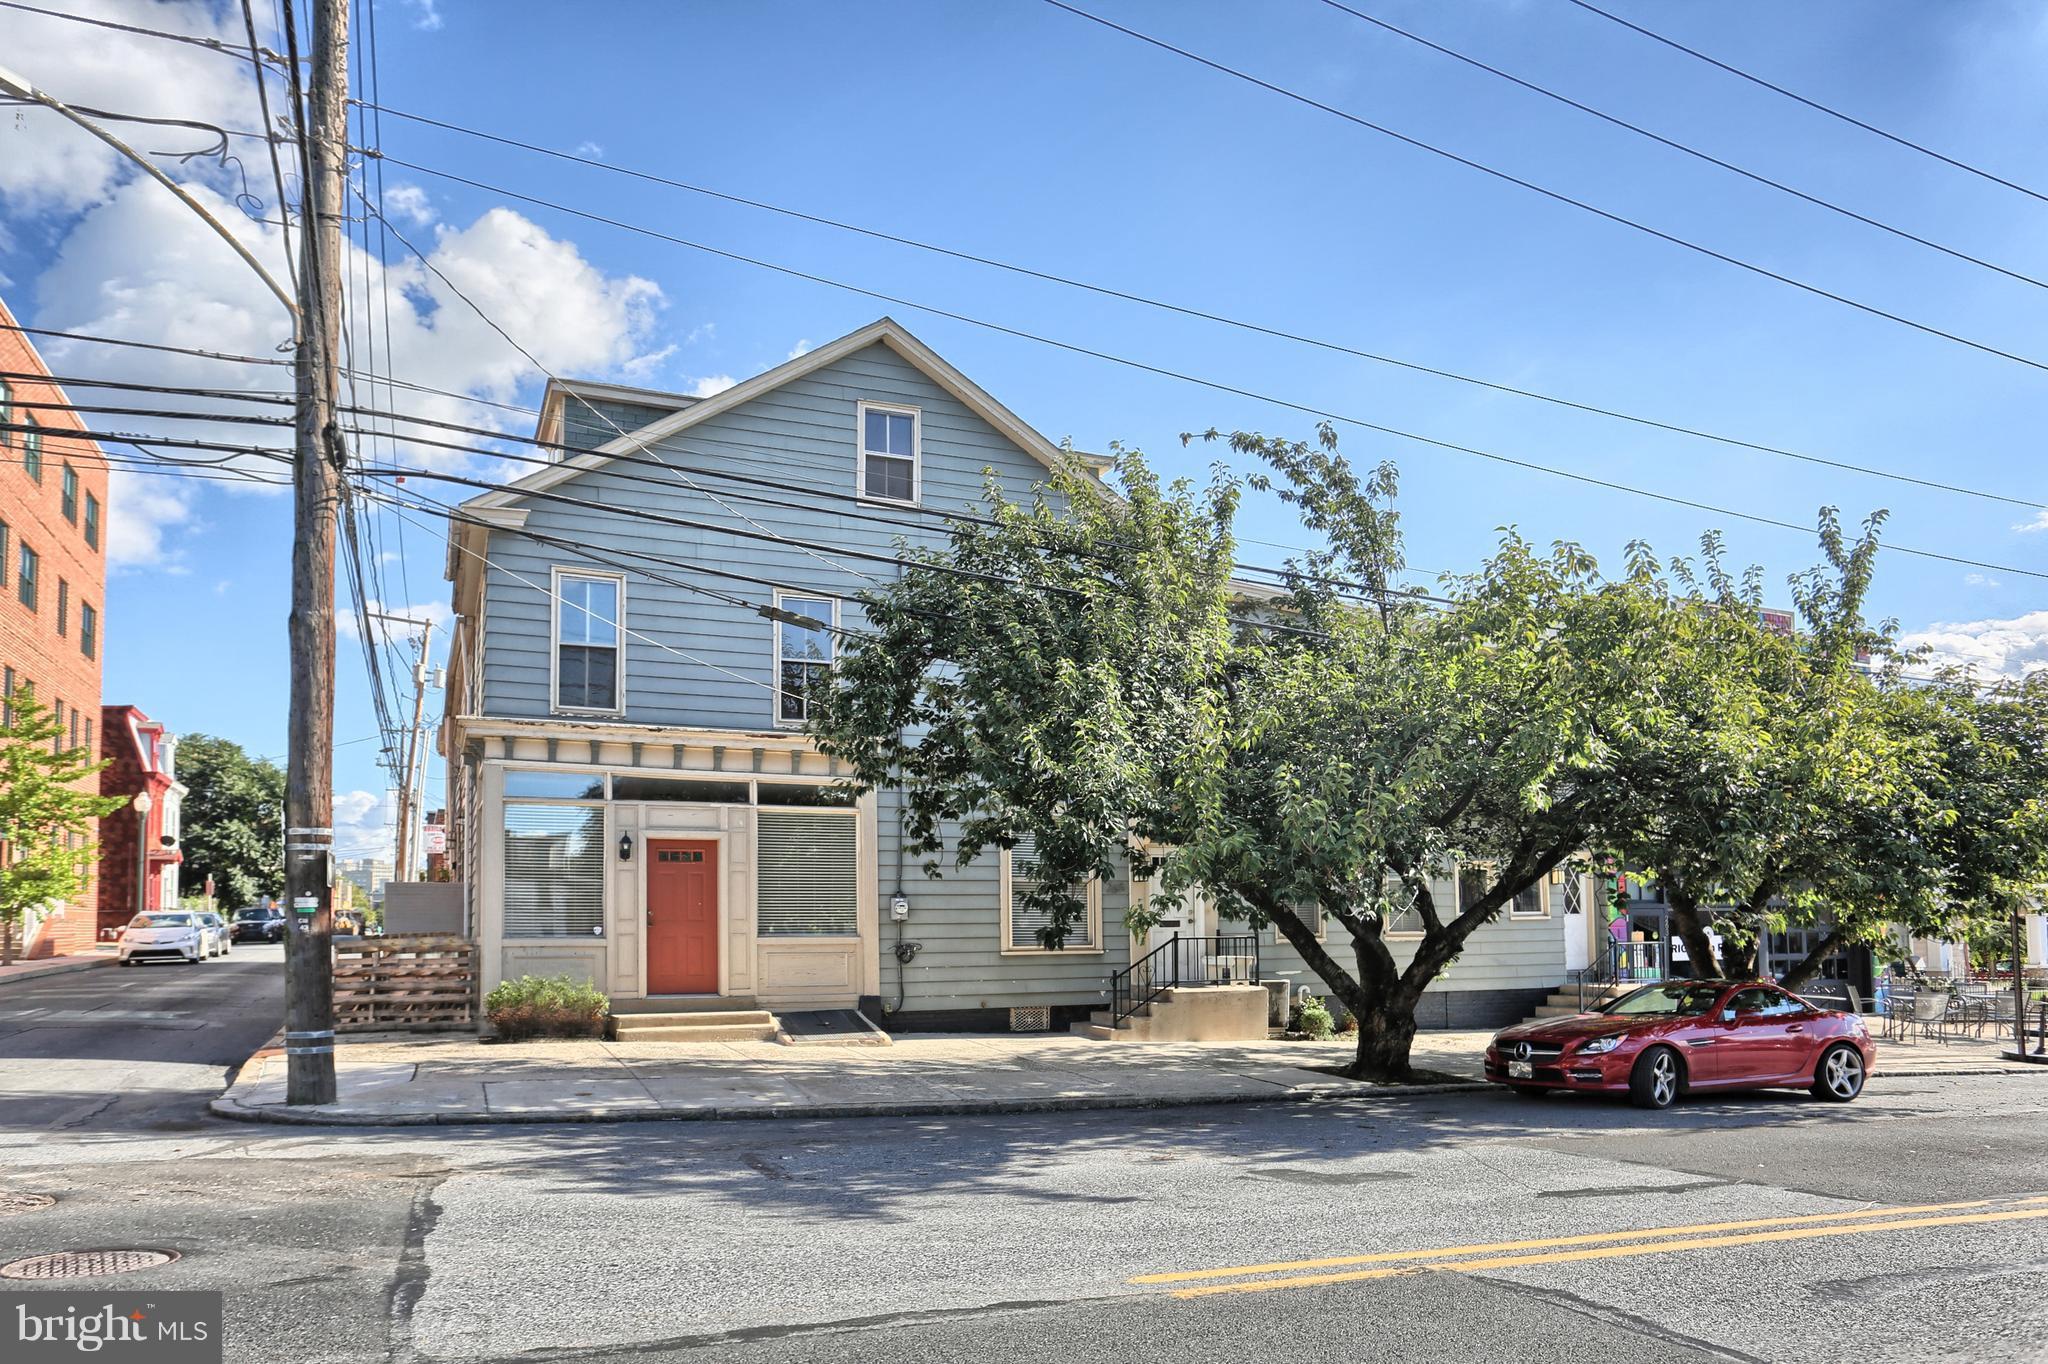 265 REILY STREET, HARRISBURG, PA 17102